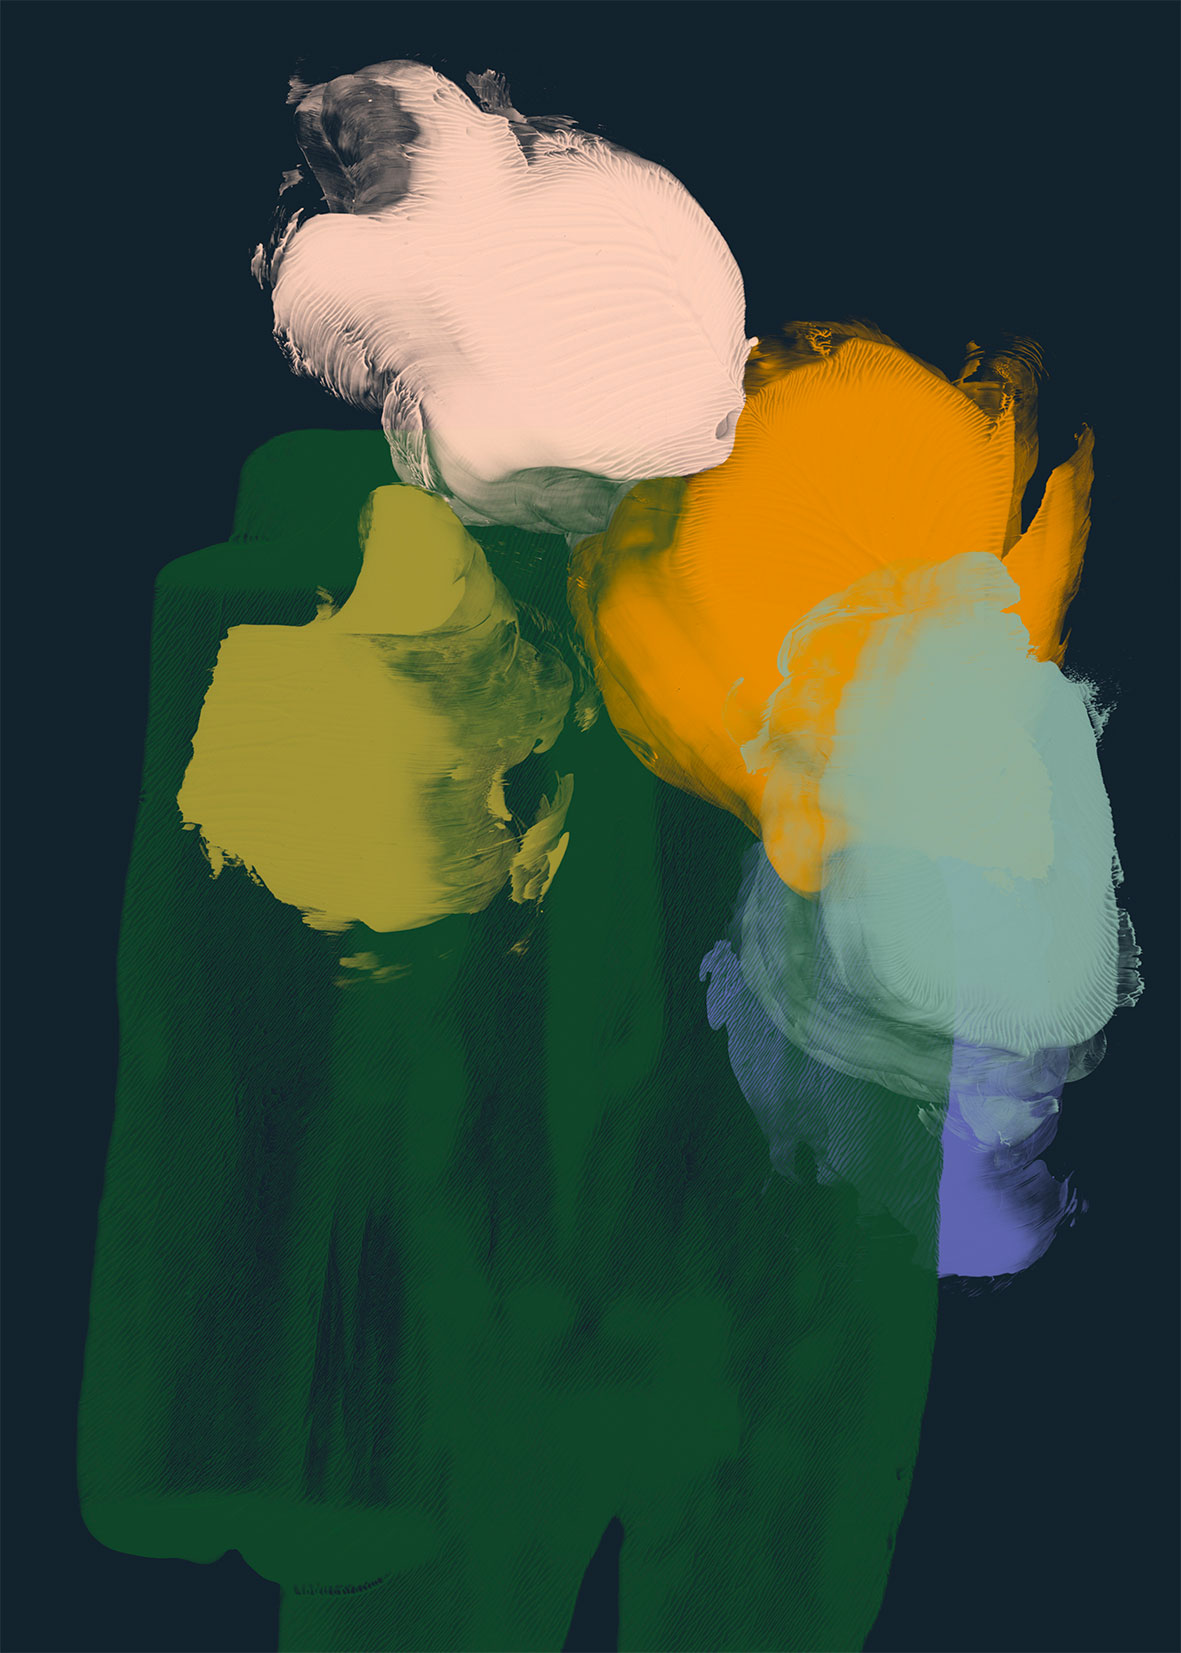 Kukkapuska, 2014, Pigmenttiprintti paperille, 100 x 70 cm. / Flower Bunch, 2014, Pigmentprint on paper, 100 x 70 cm.  © Reeta Ek